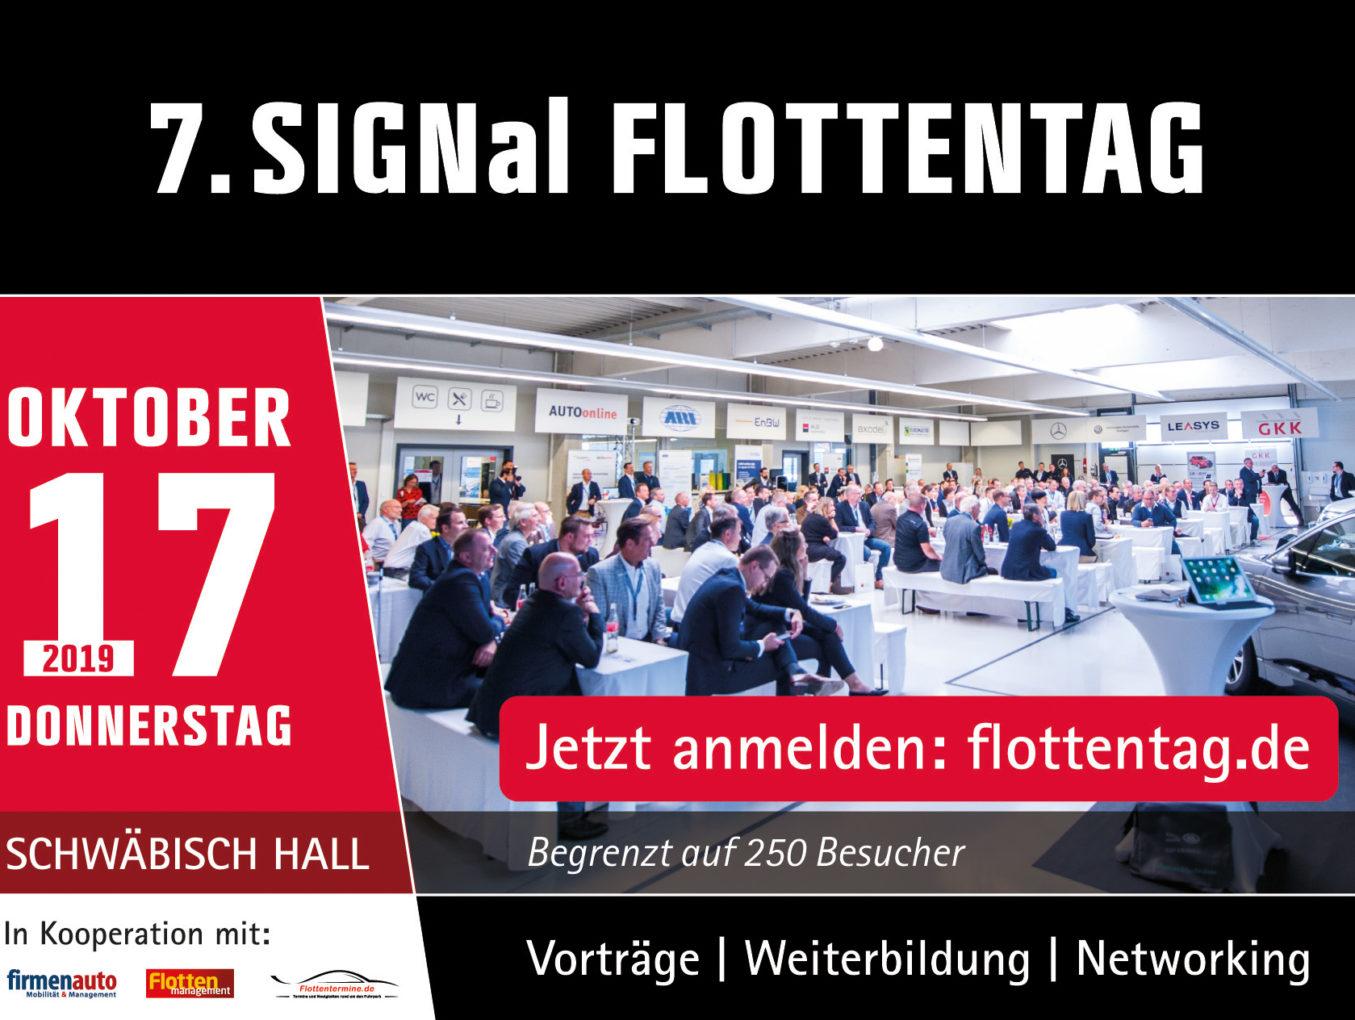 Stargäste beim 7. SIGNal Flottentag: Felix Neureuther und Jörg Bergmeister